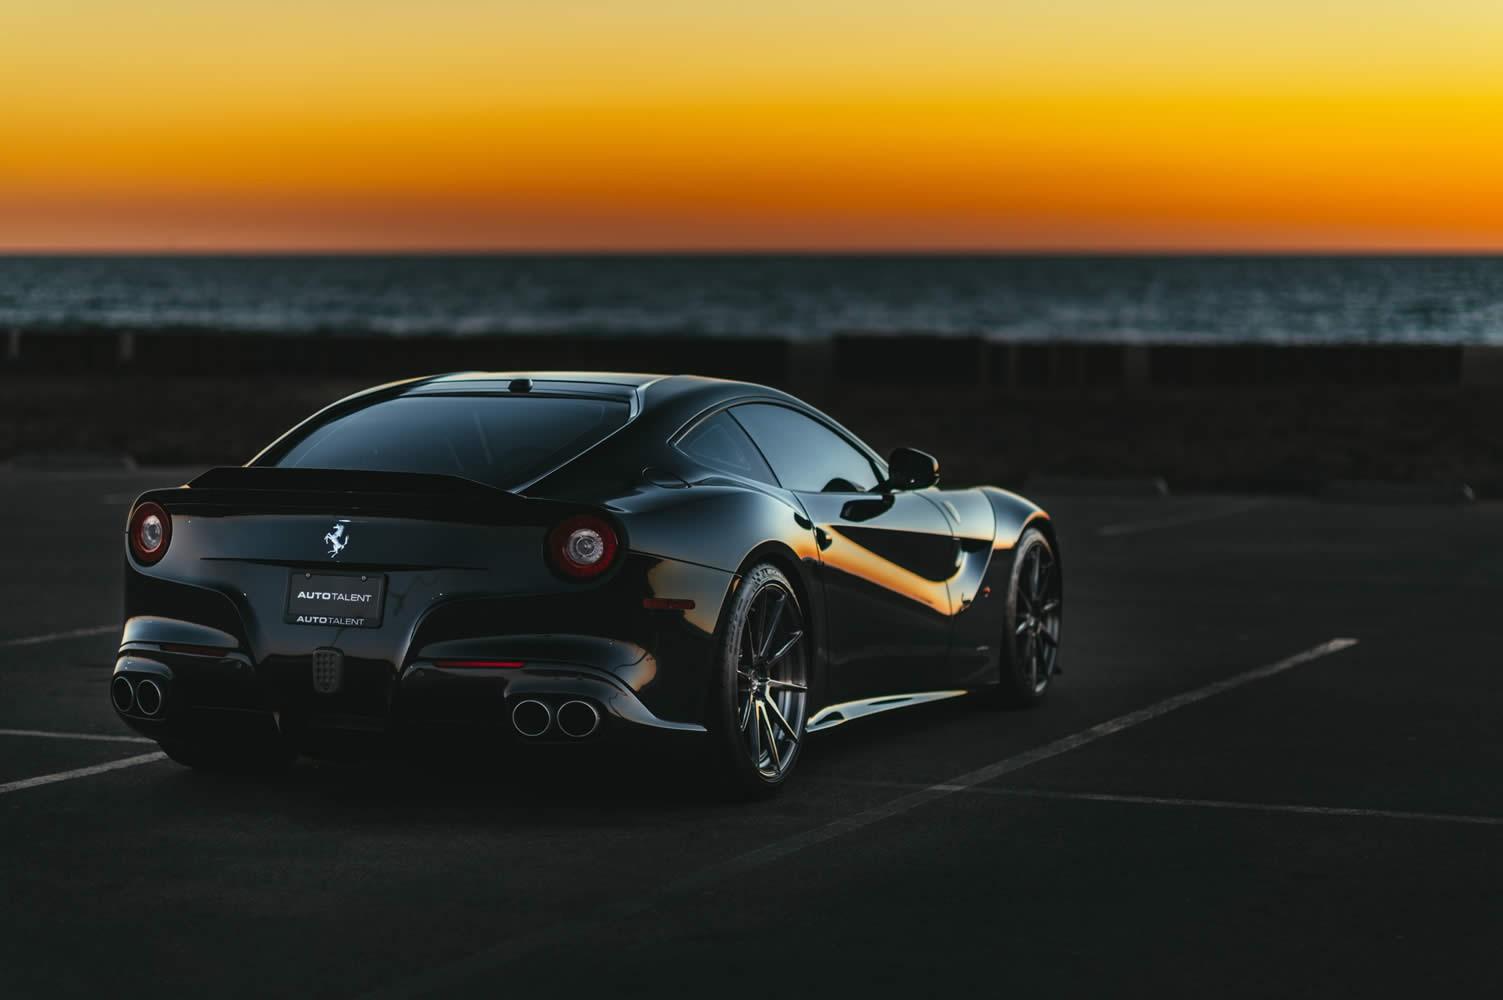 Ferrari F12berlinetta Background